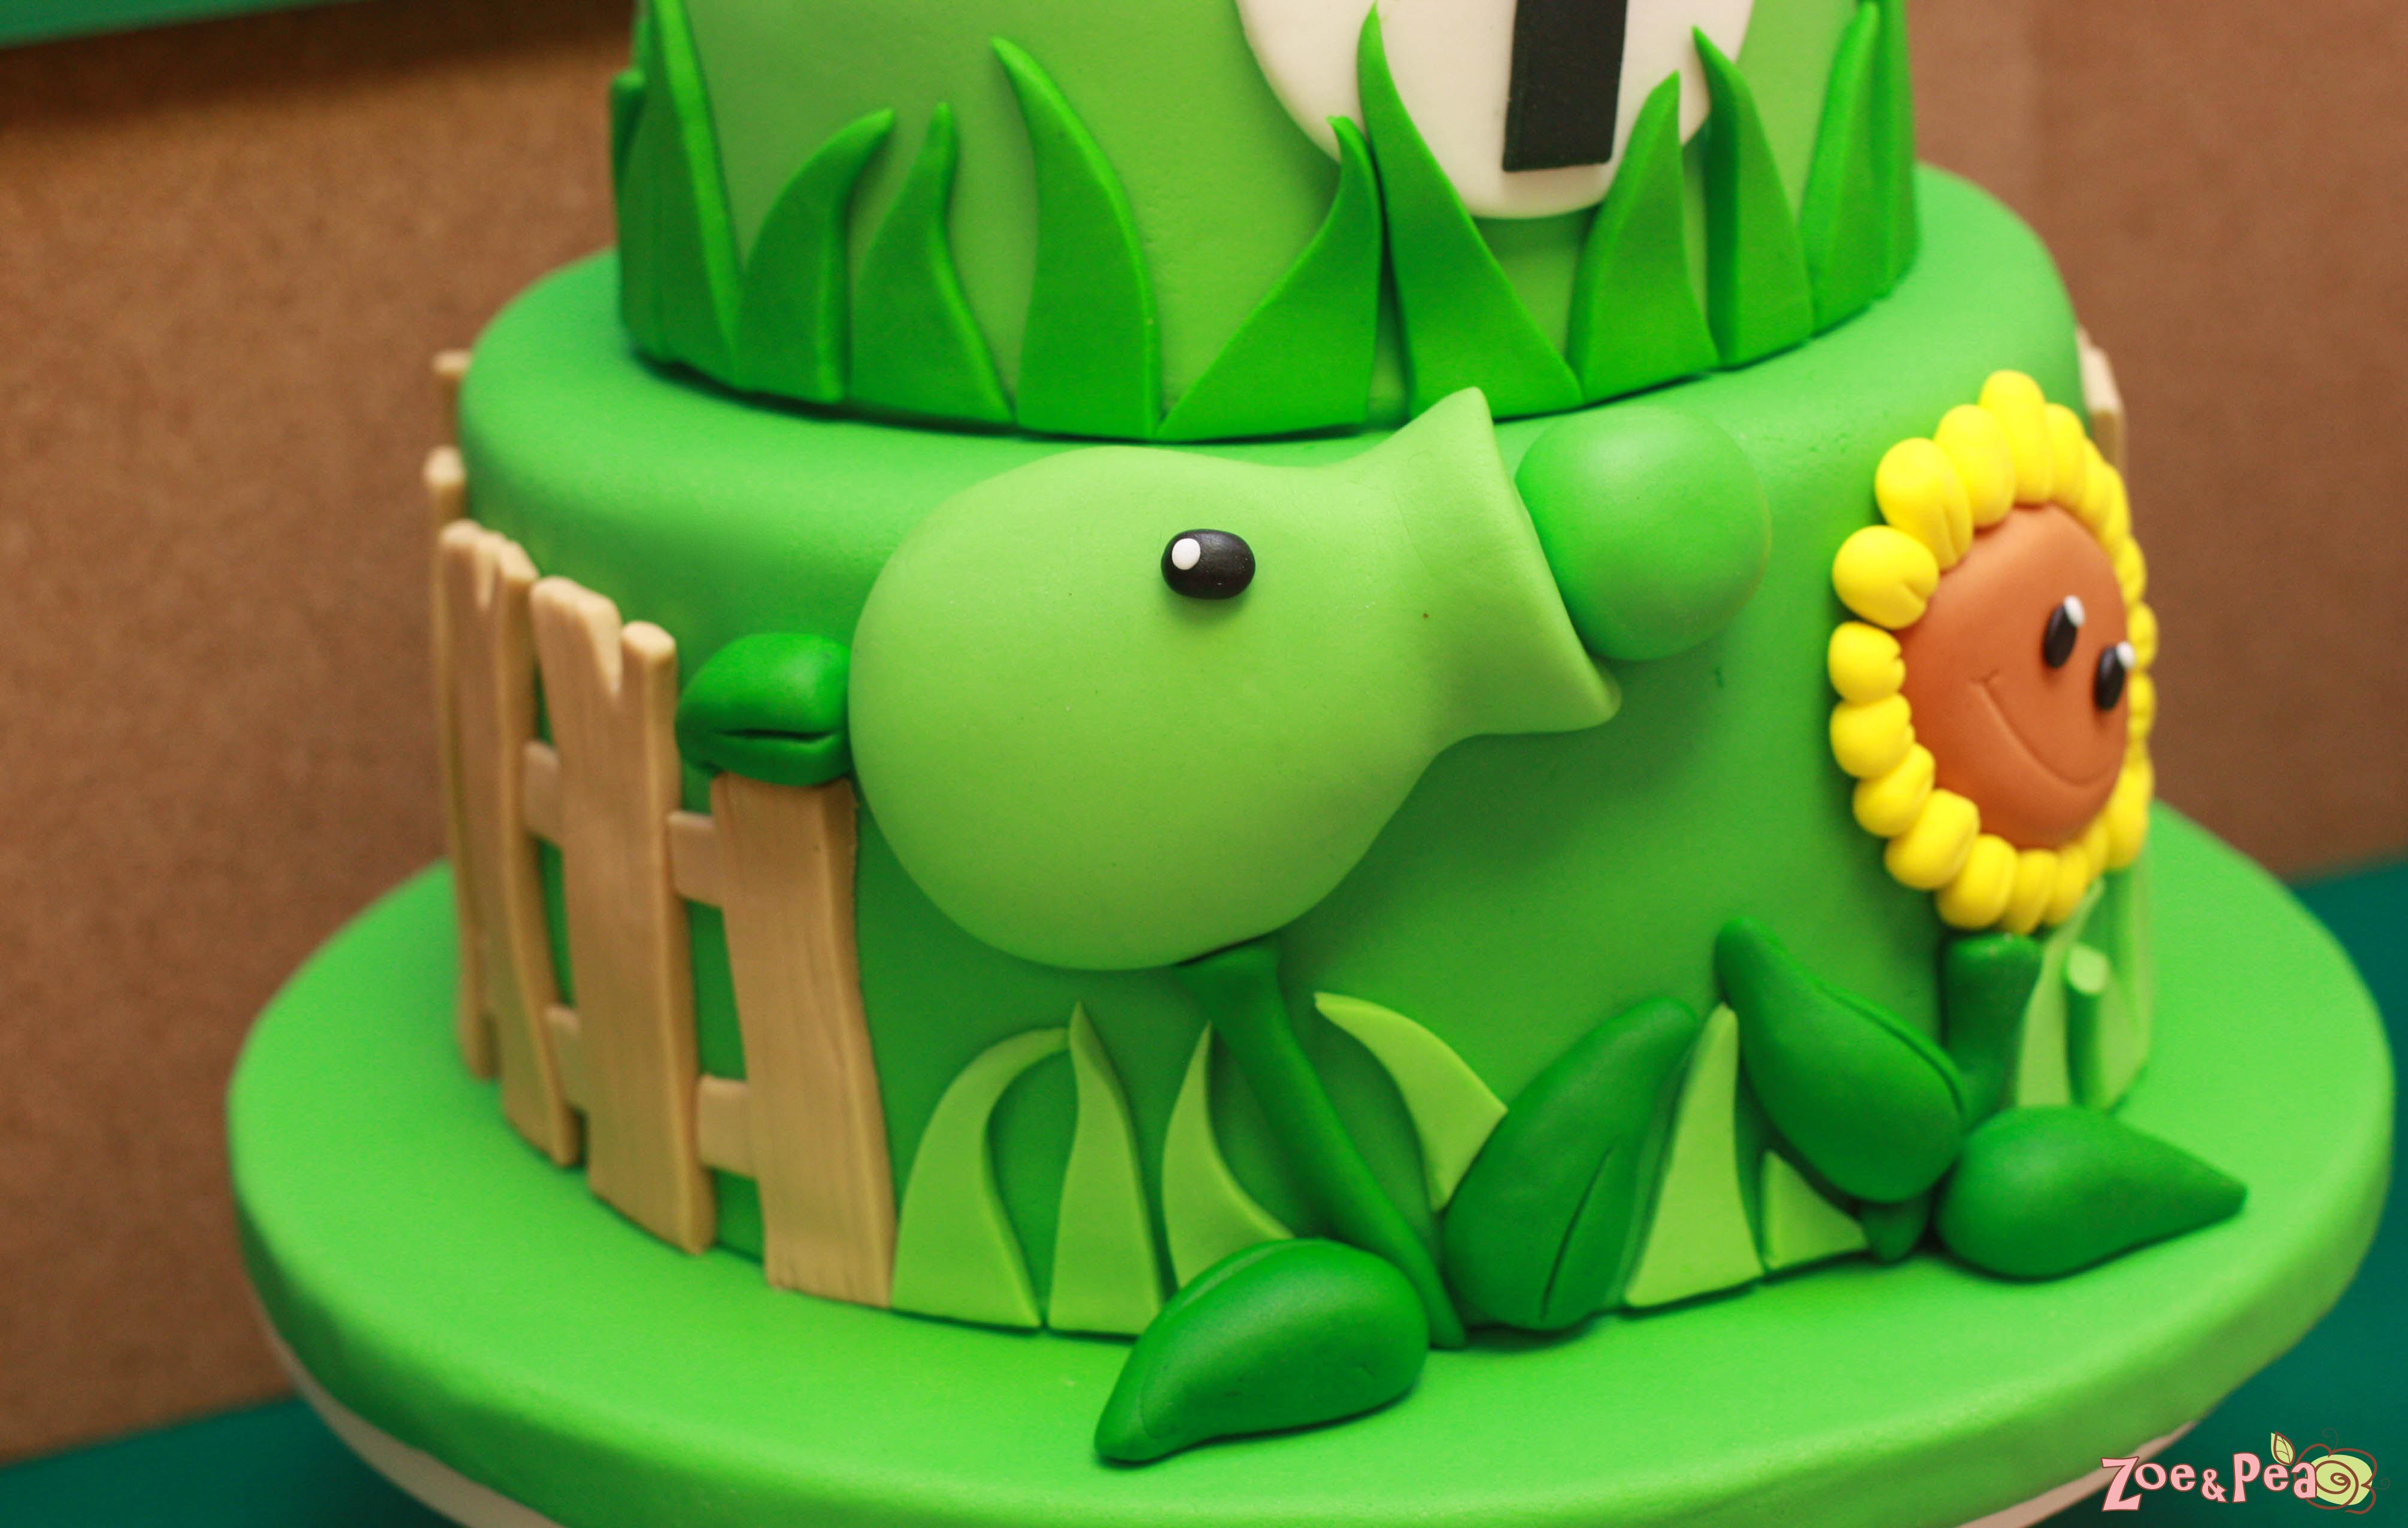 Plants vs zombies birthday zoe pea sweets vs zombies birthday totalgable centerpiece cake side1 lado cake closeup cake cake side of cake voltagebd Image collections